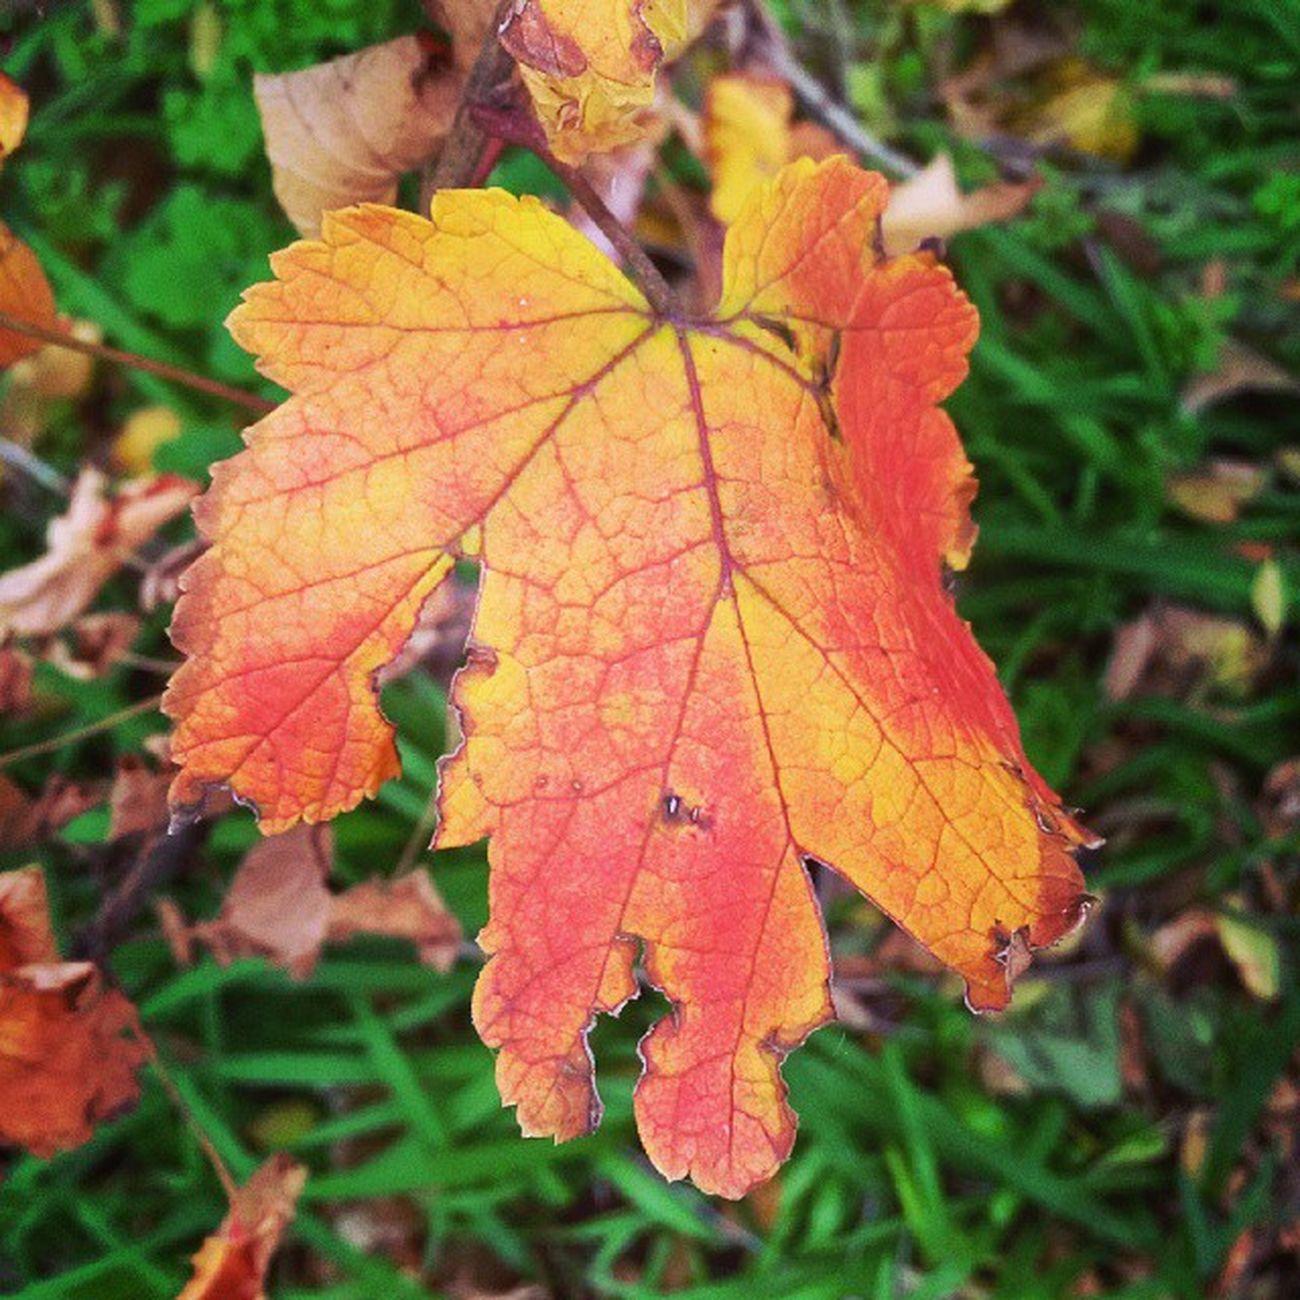 Autumn. Fall Autumn Leaves Tagsforlikes falltime season seasons instafall instagood TFLers instaautumn photooftheday leaf foliage colorful orange red autumnweather fallweather nature Russia